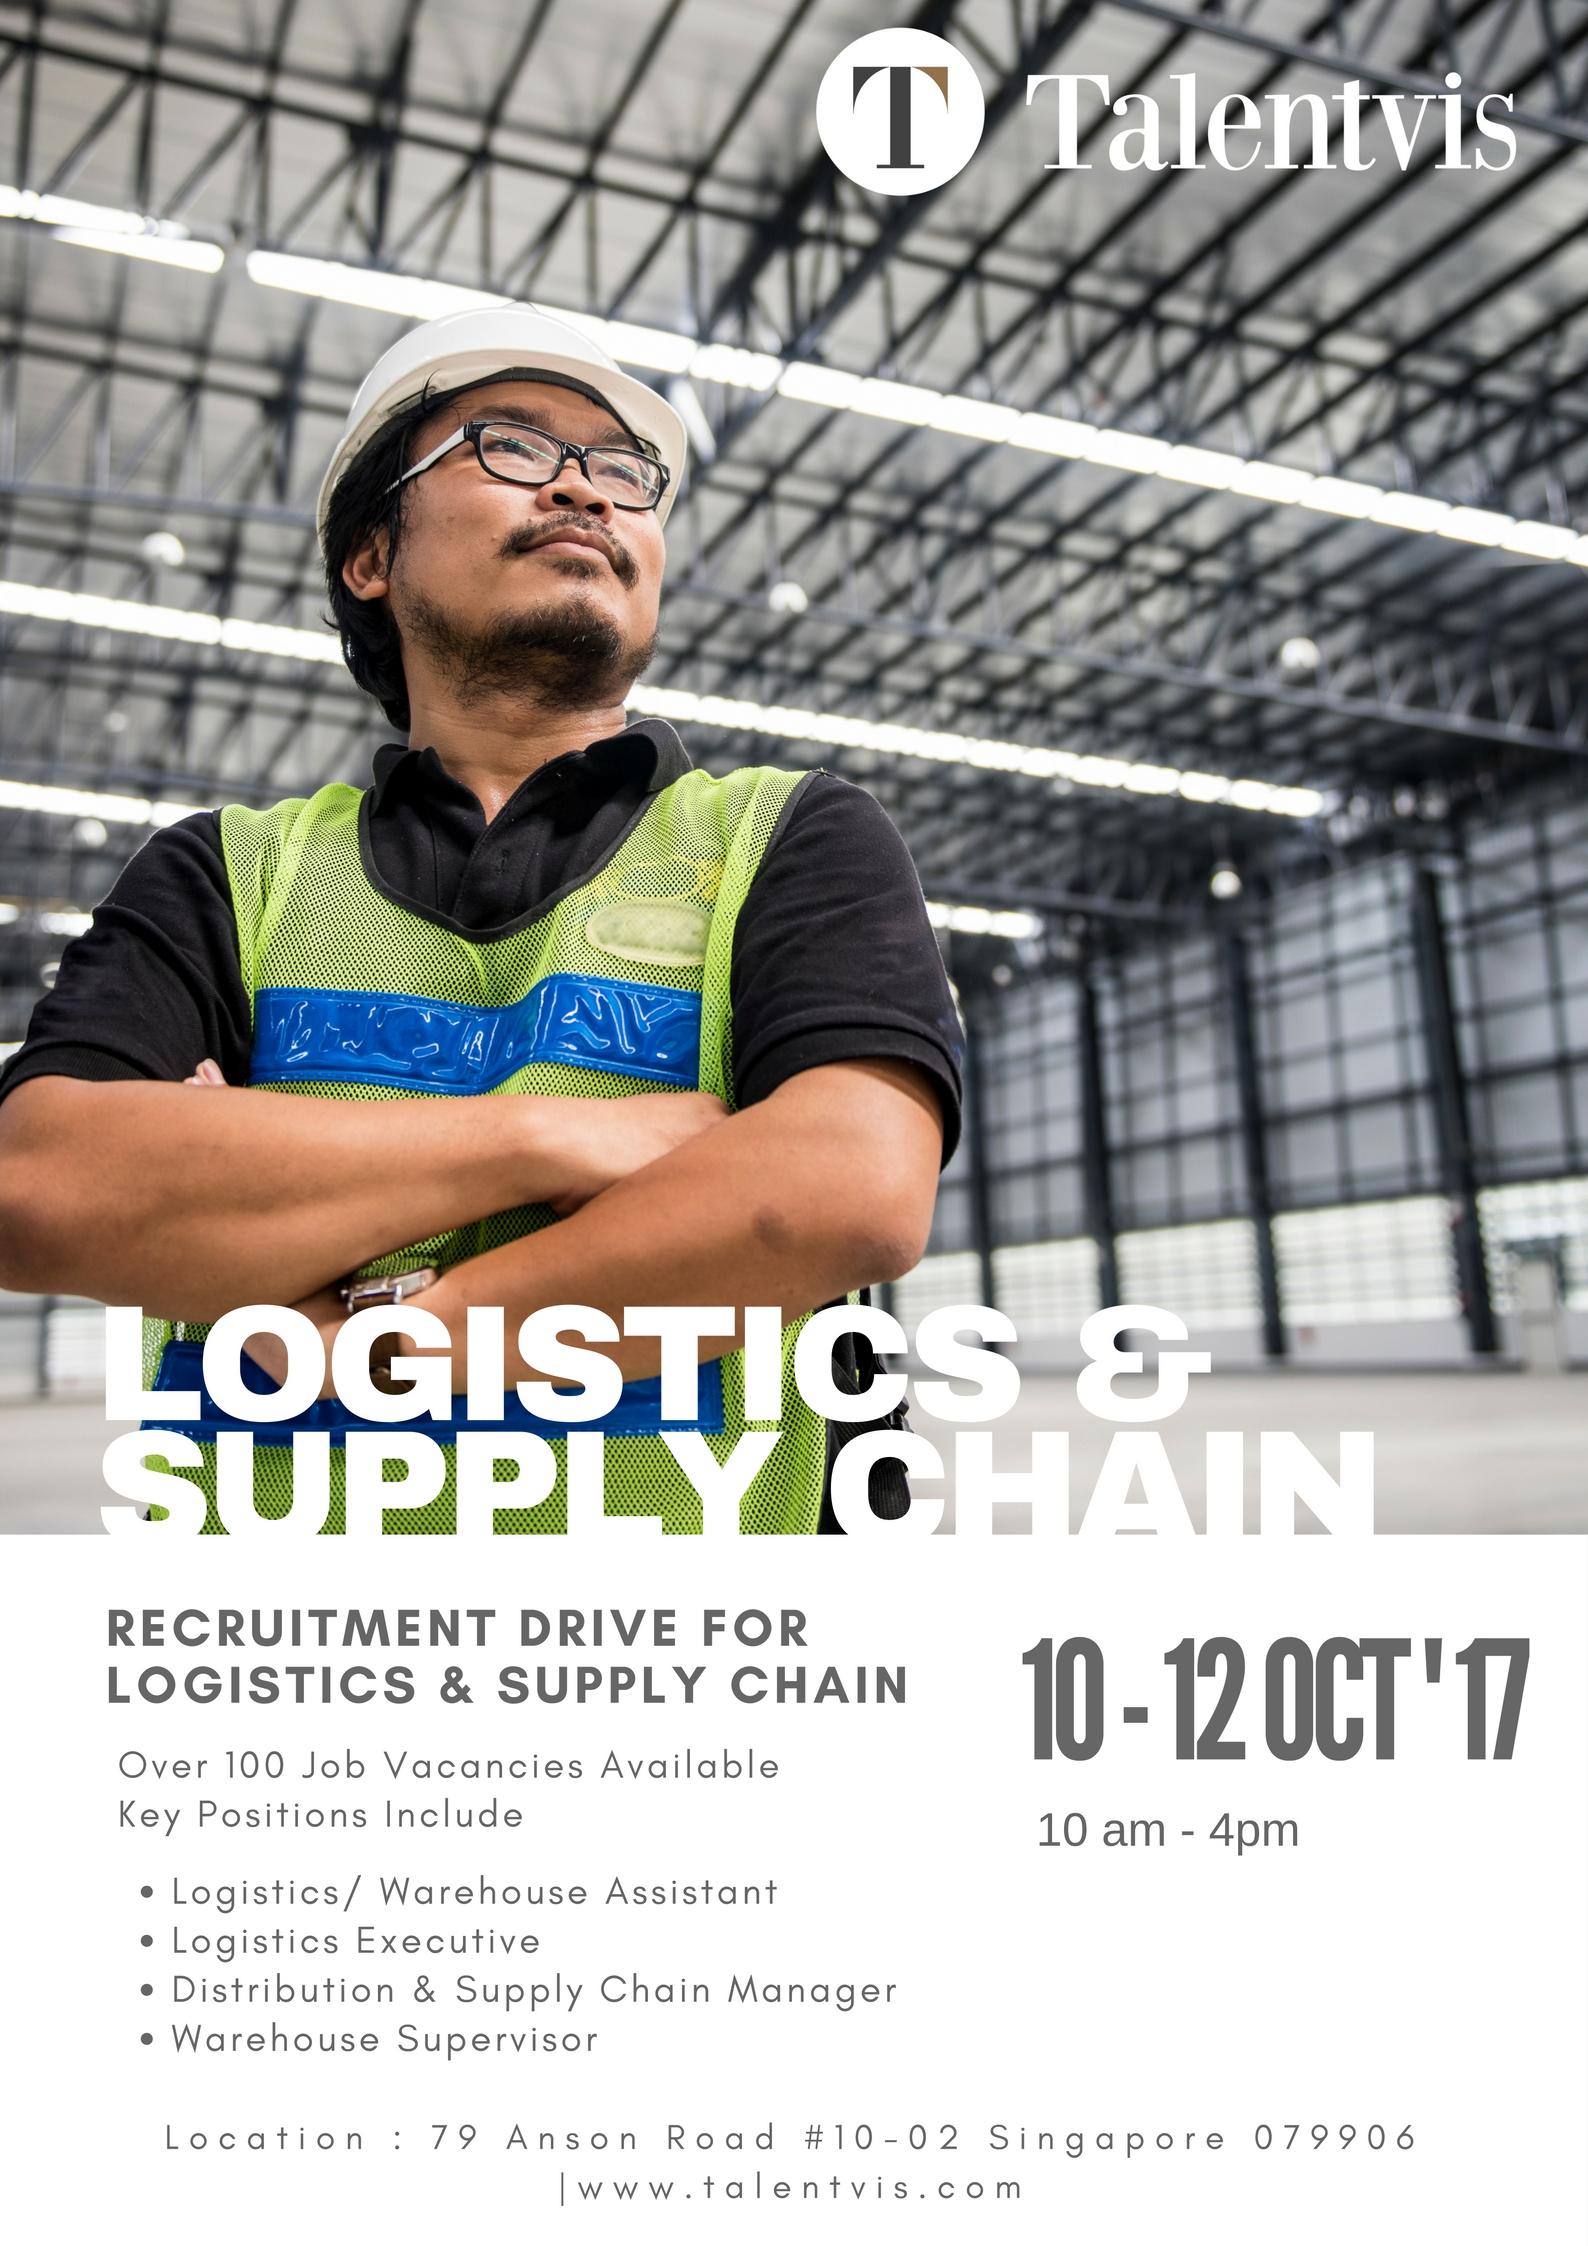 Logistics & Supply Chain Recruitment Drive @ Talentvis Singapore